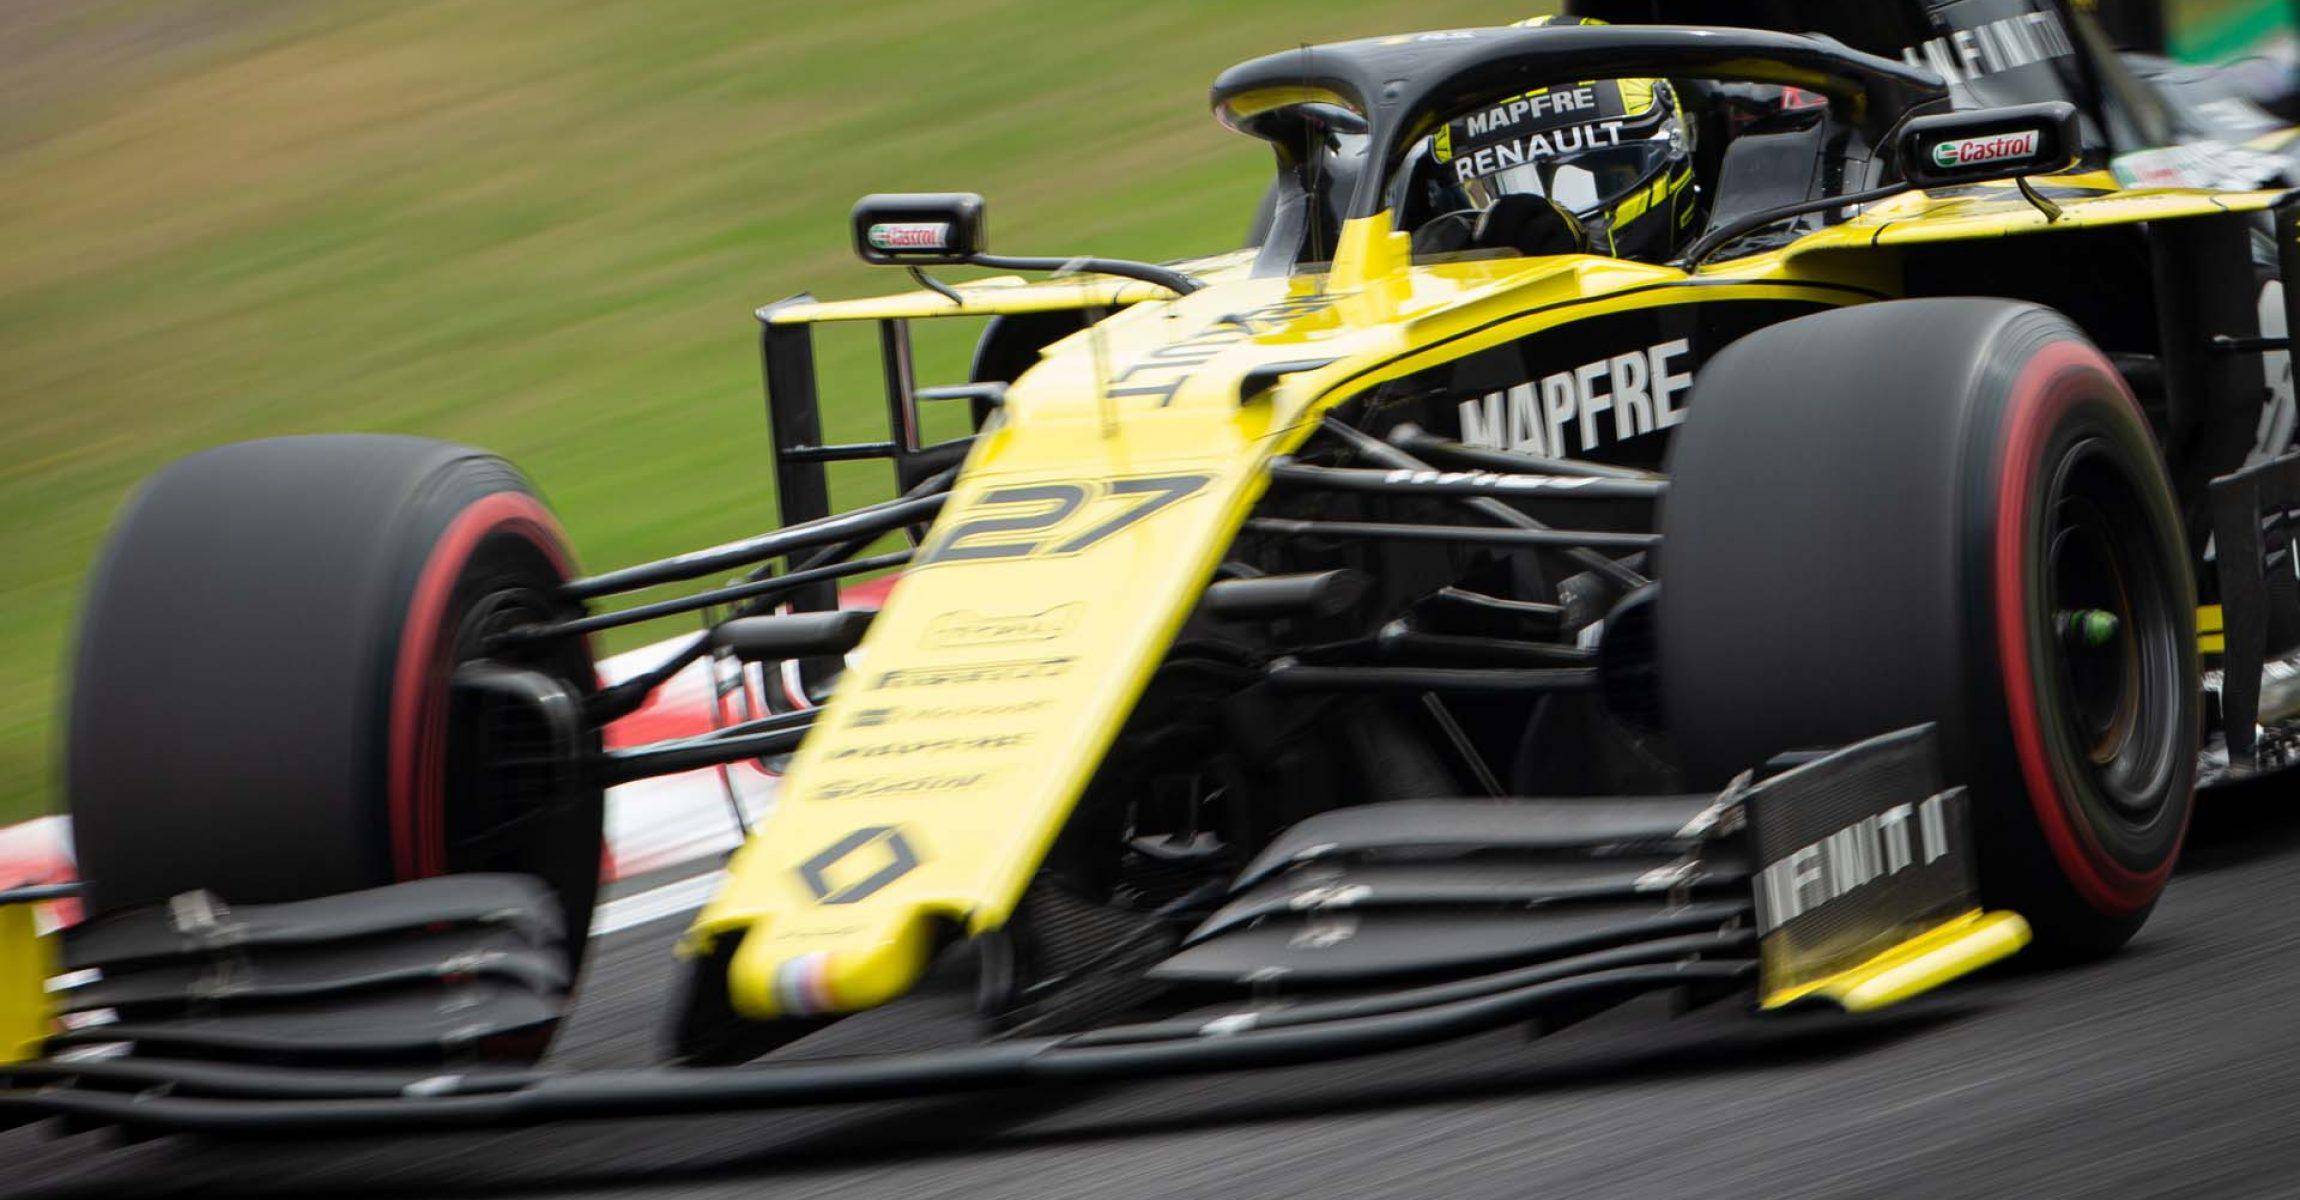 Nico Hulkenberg (GER) Renault F1 Team RS19. Japanese Grand Prix, Friday 11th October 2019. Suzuka, Japan. Hülkenberg